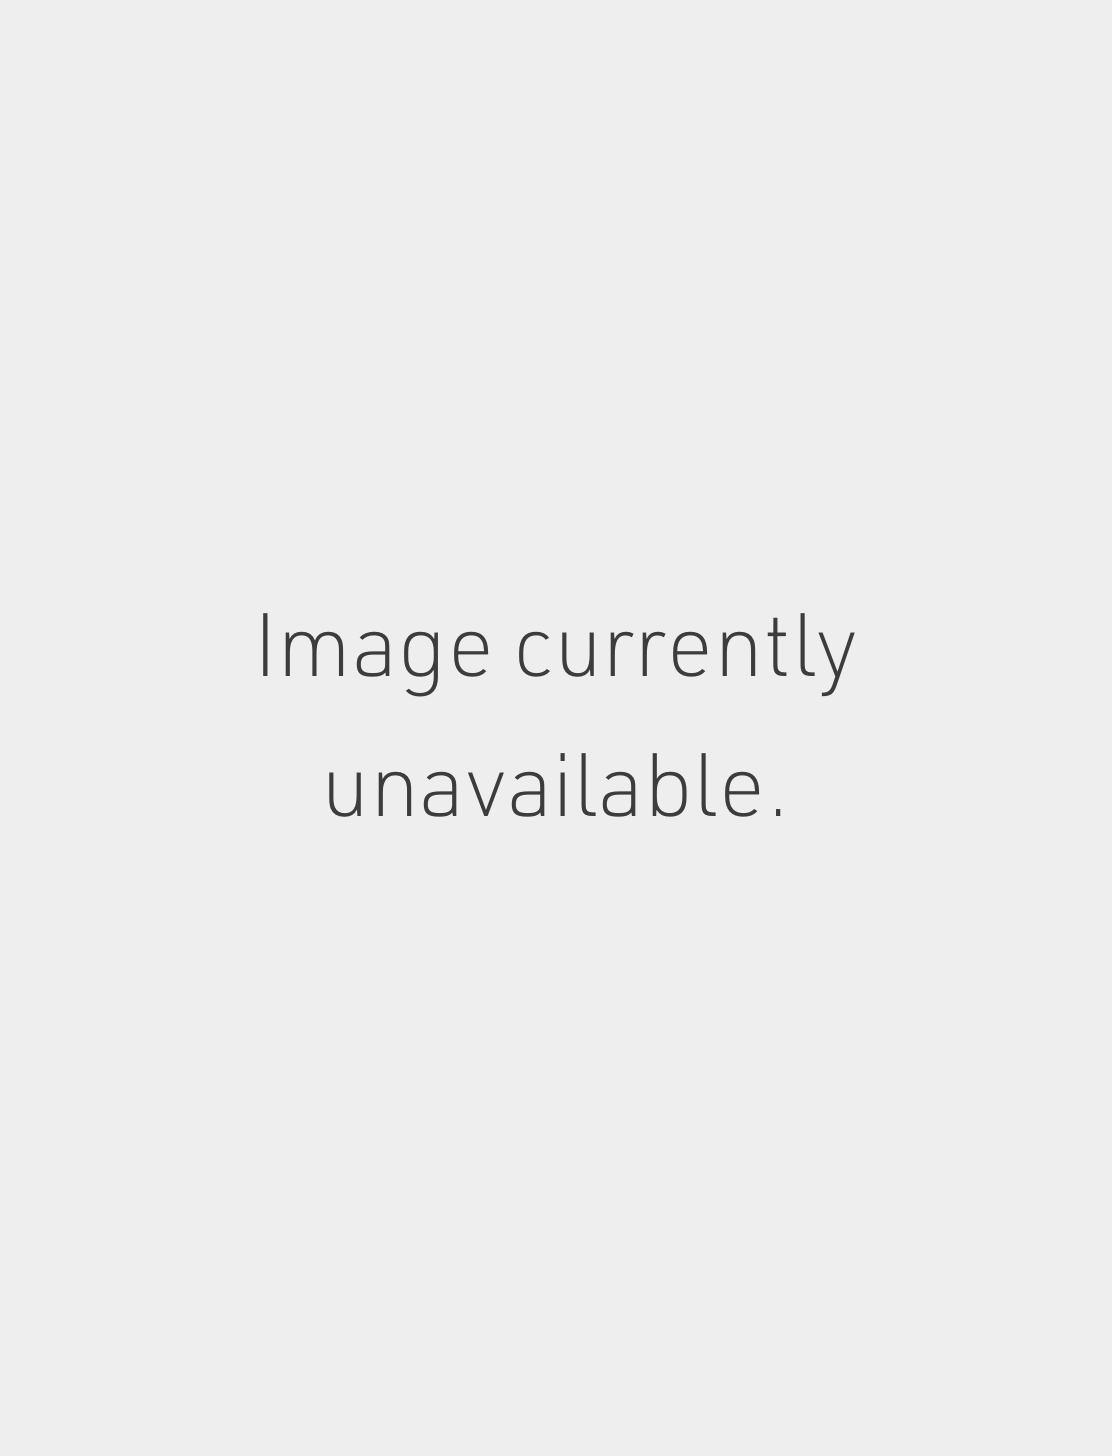 4mm Rose Cut Diamond Pave Ouroboros Threaded Stud Image #1